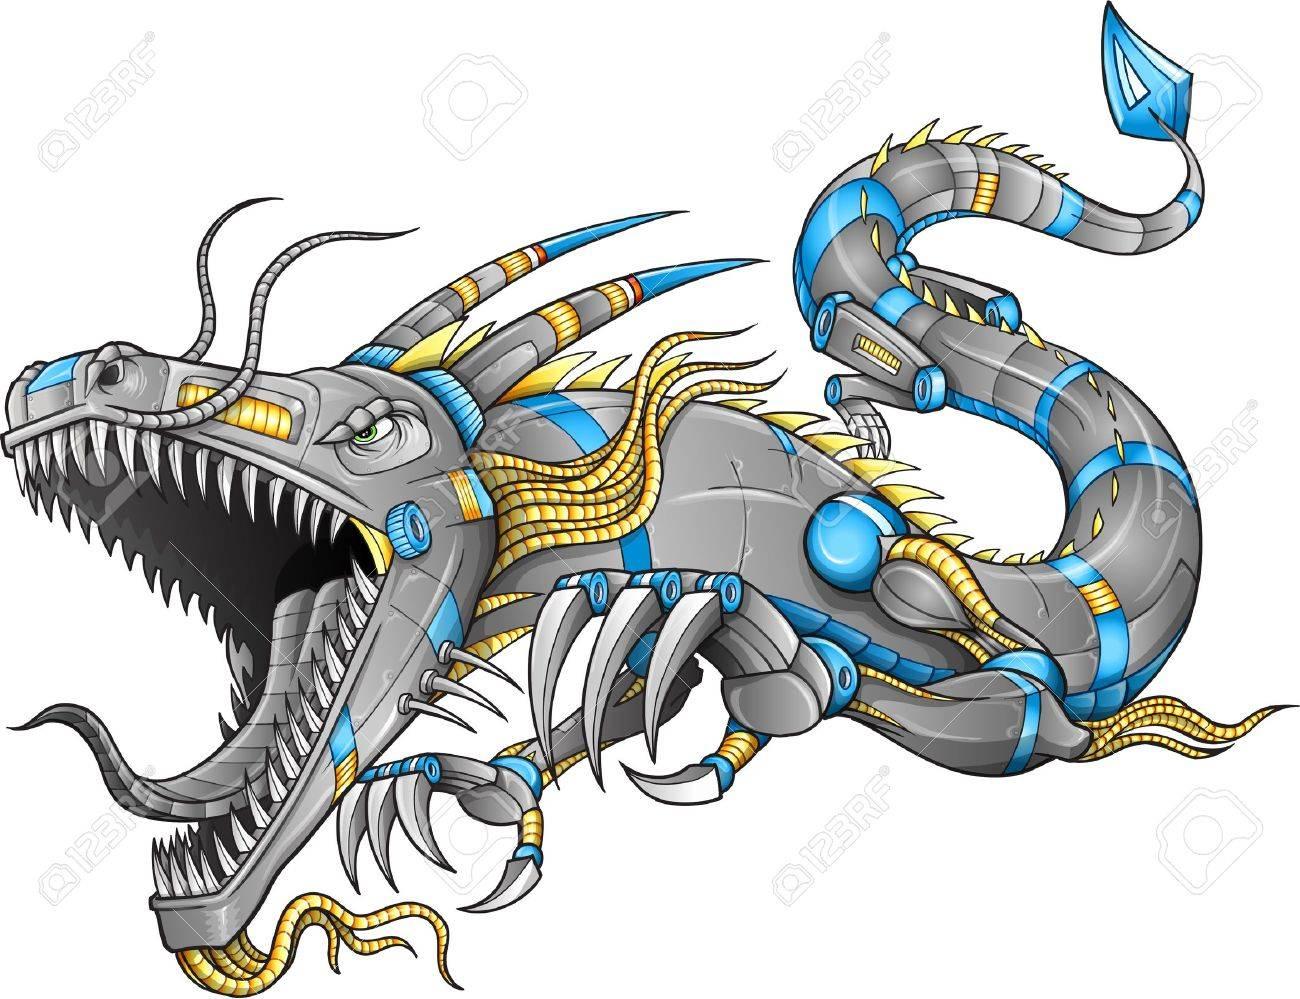 Robot Cyborg Dragon - 15560468